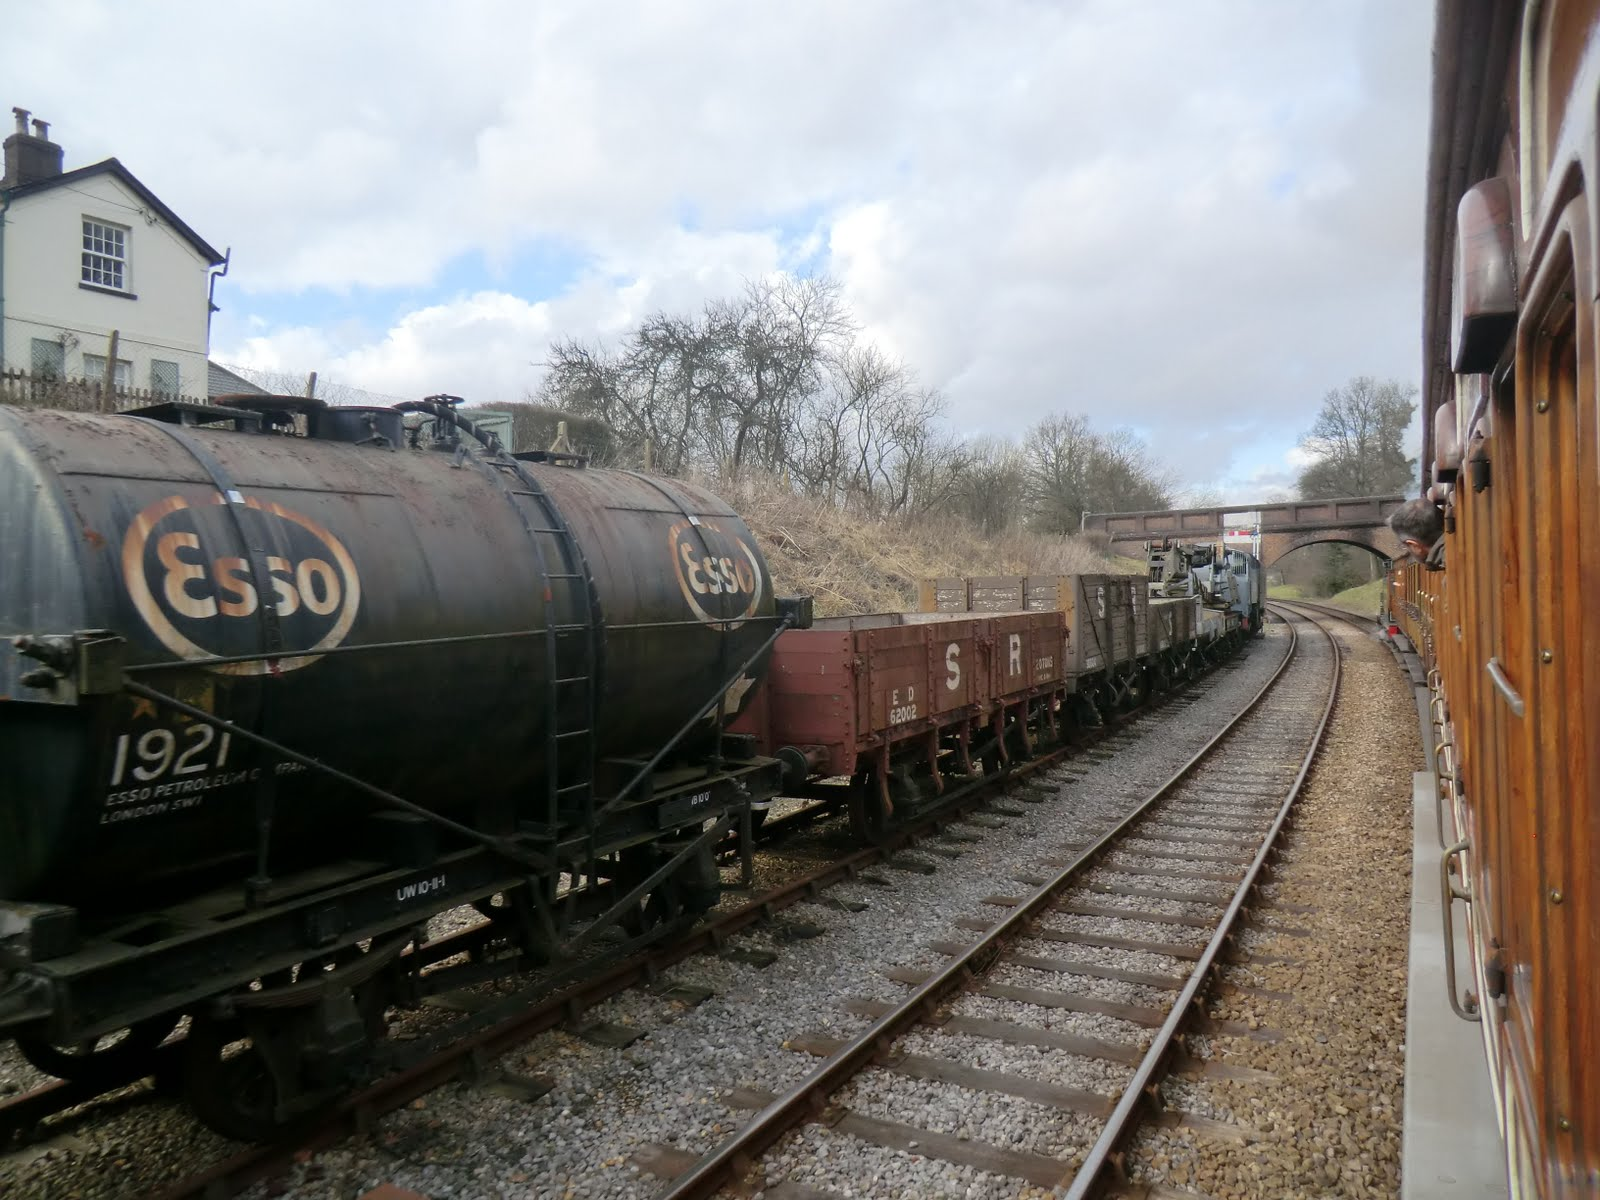 CIMG6232 The 16:17 leaving Horsted Keynes station